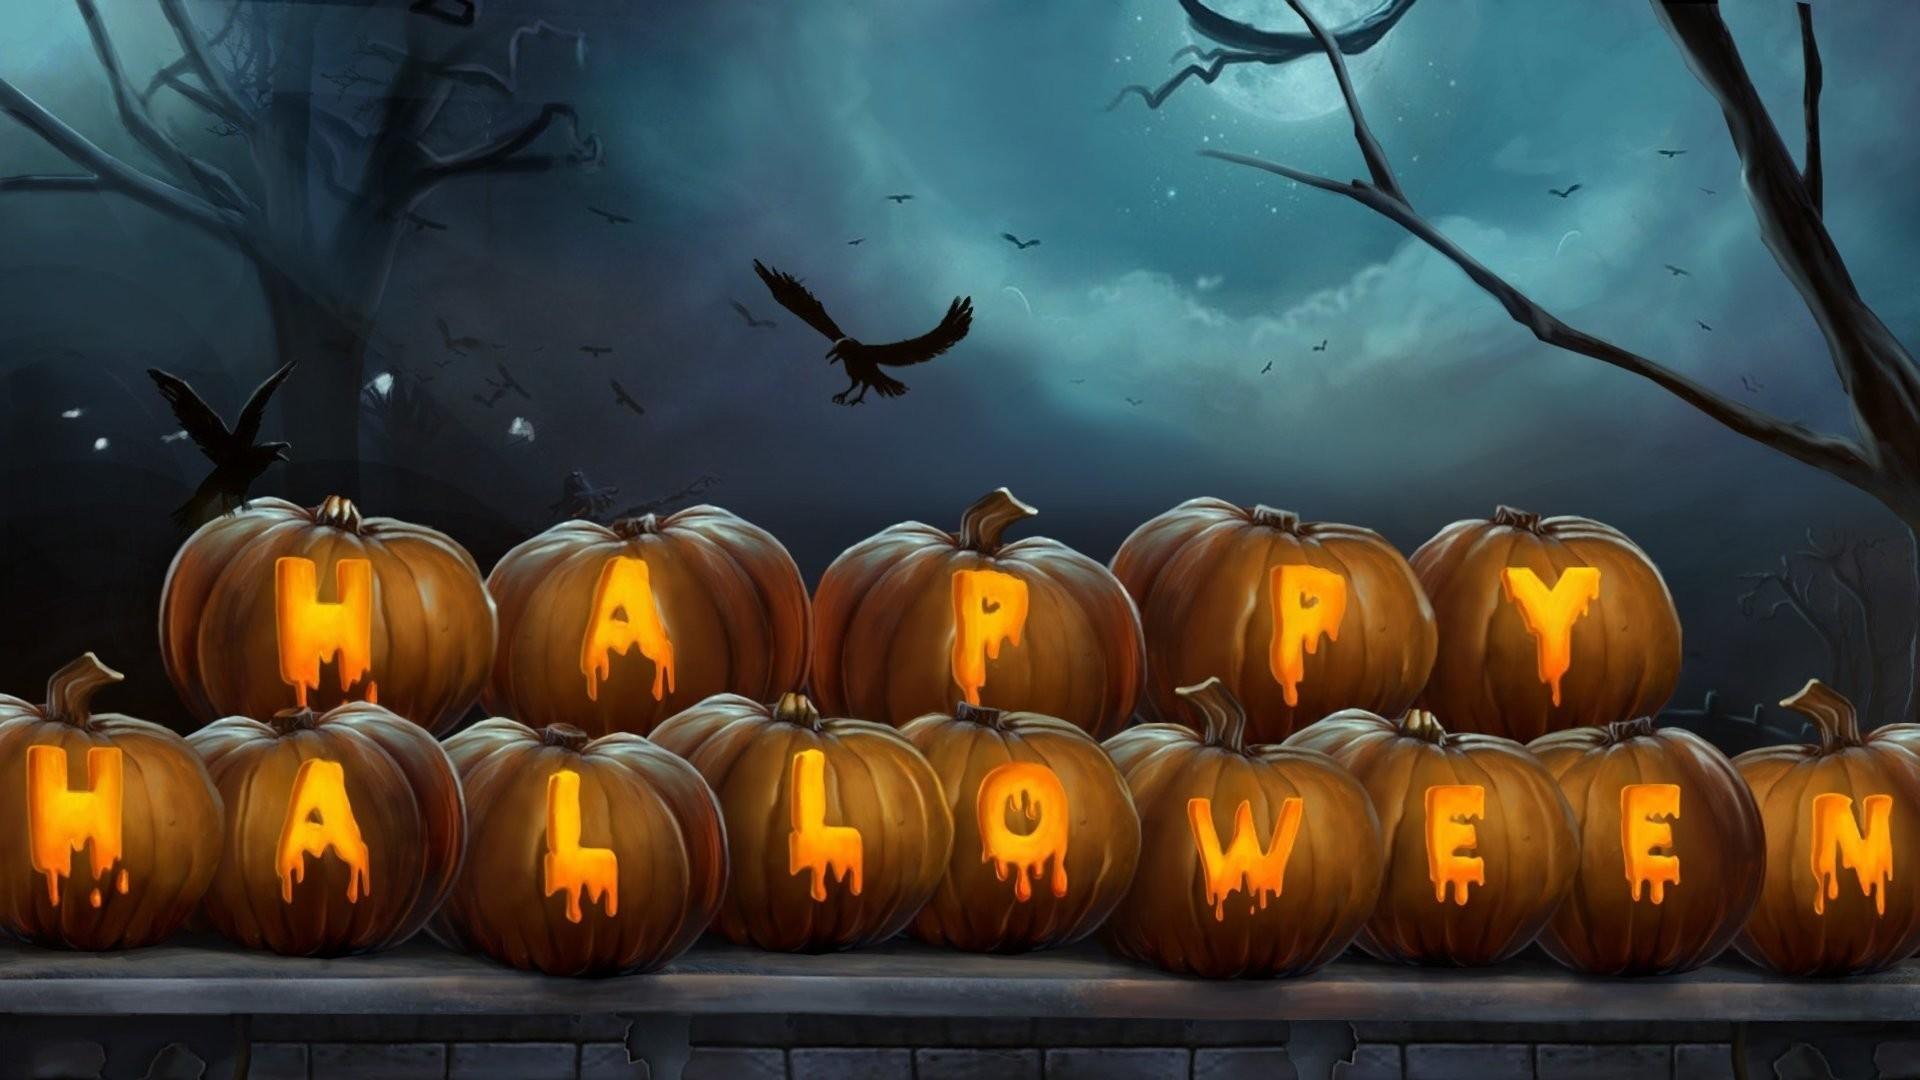 Halloween hd desktop wallpaper